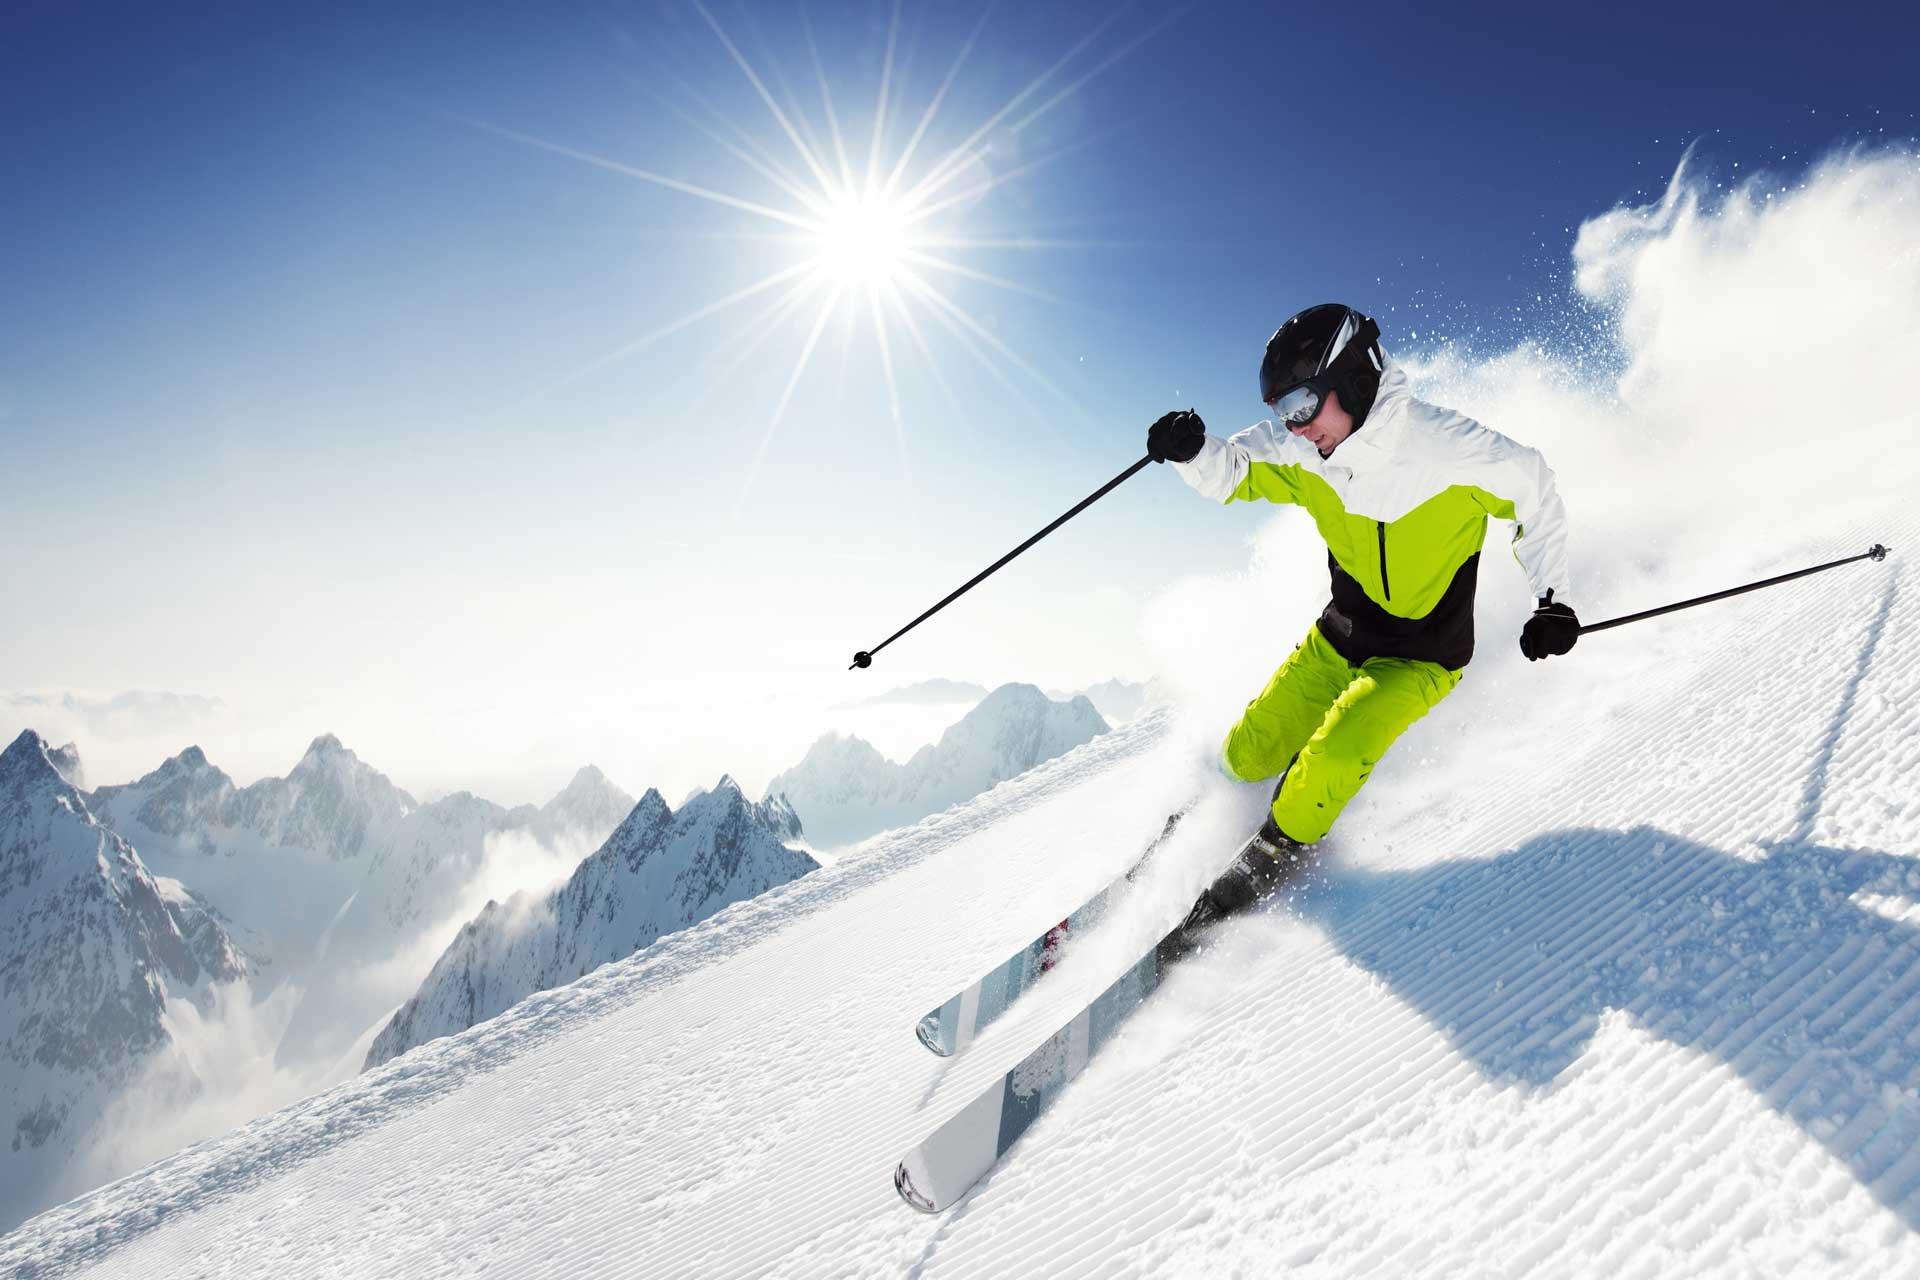 skiing winter snow ski mountains wallpaper 1920x1280 536210 wallpaperup